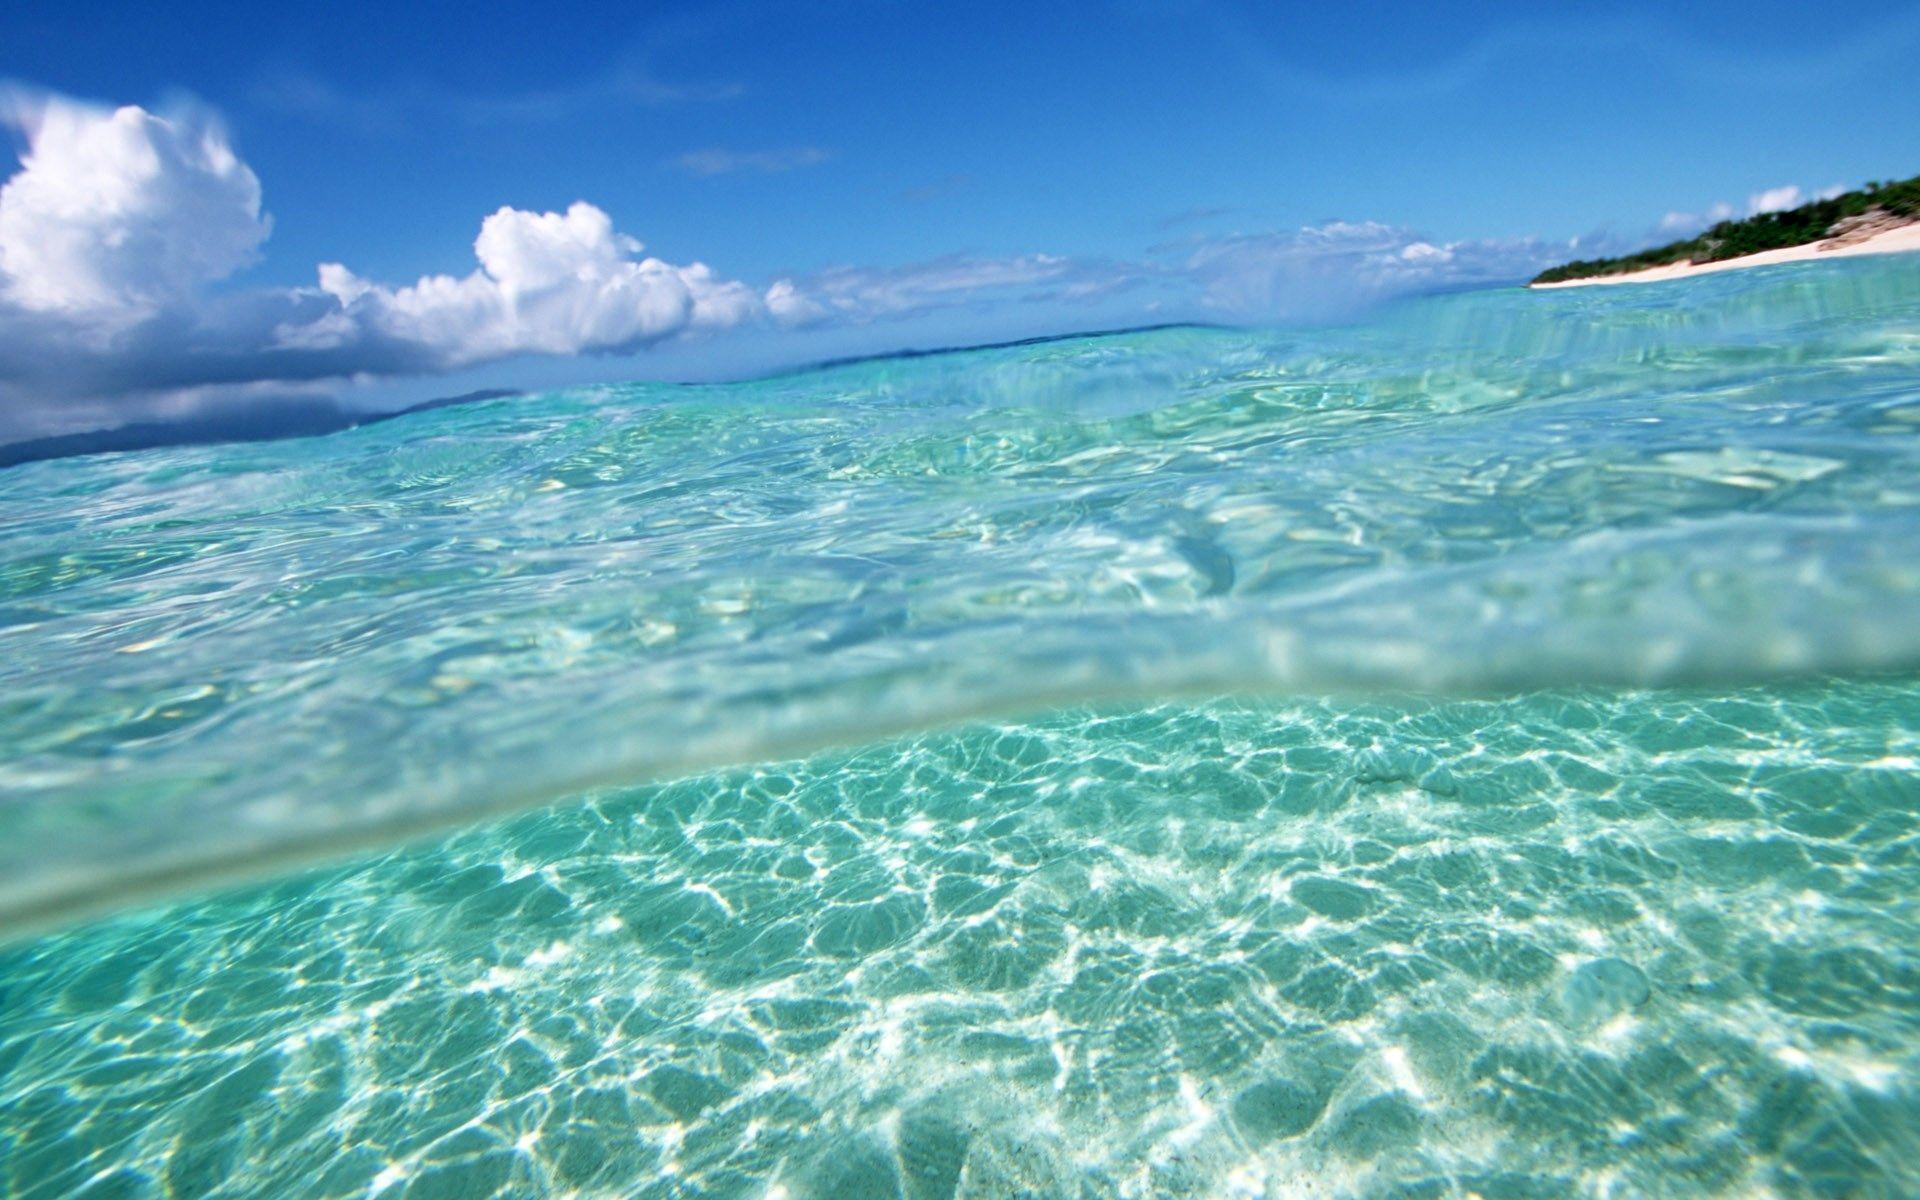 Ocean Wallpaper Free Desktop Wallpapers Ocean Wallpaper Summer Screensavers Beach Pictures